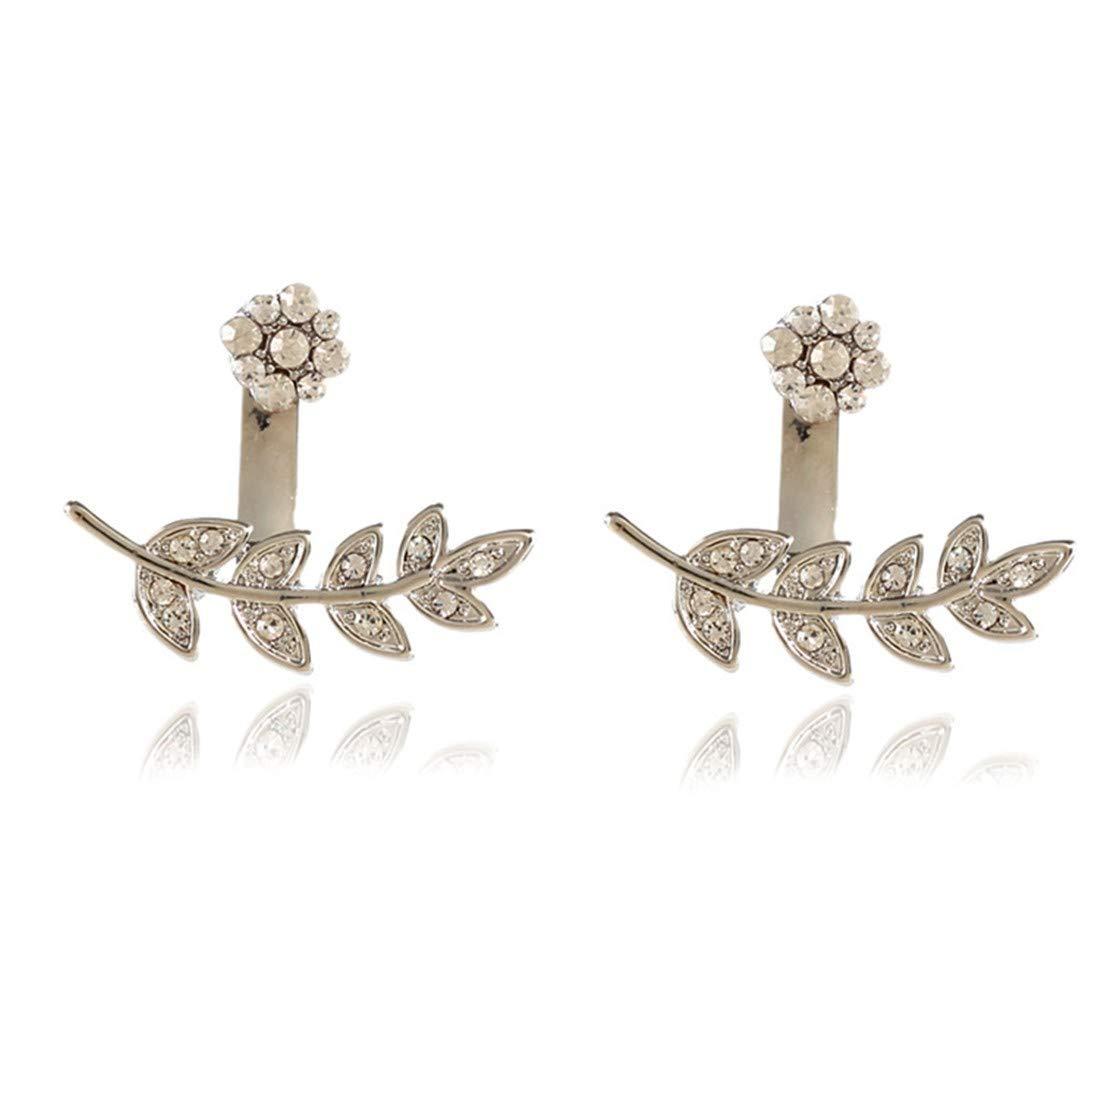 ball earrings clip on earrings ear cuffs dangle earrings earring jackets hoop earrings stud earrings Ears and ears are full of drill studs.